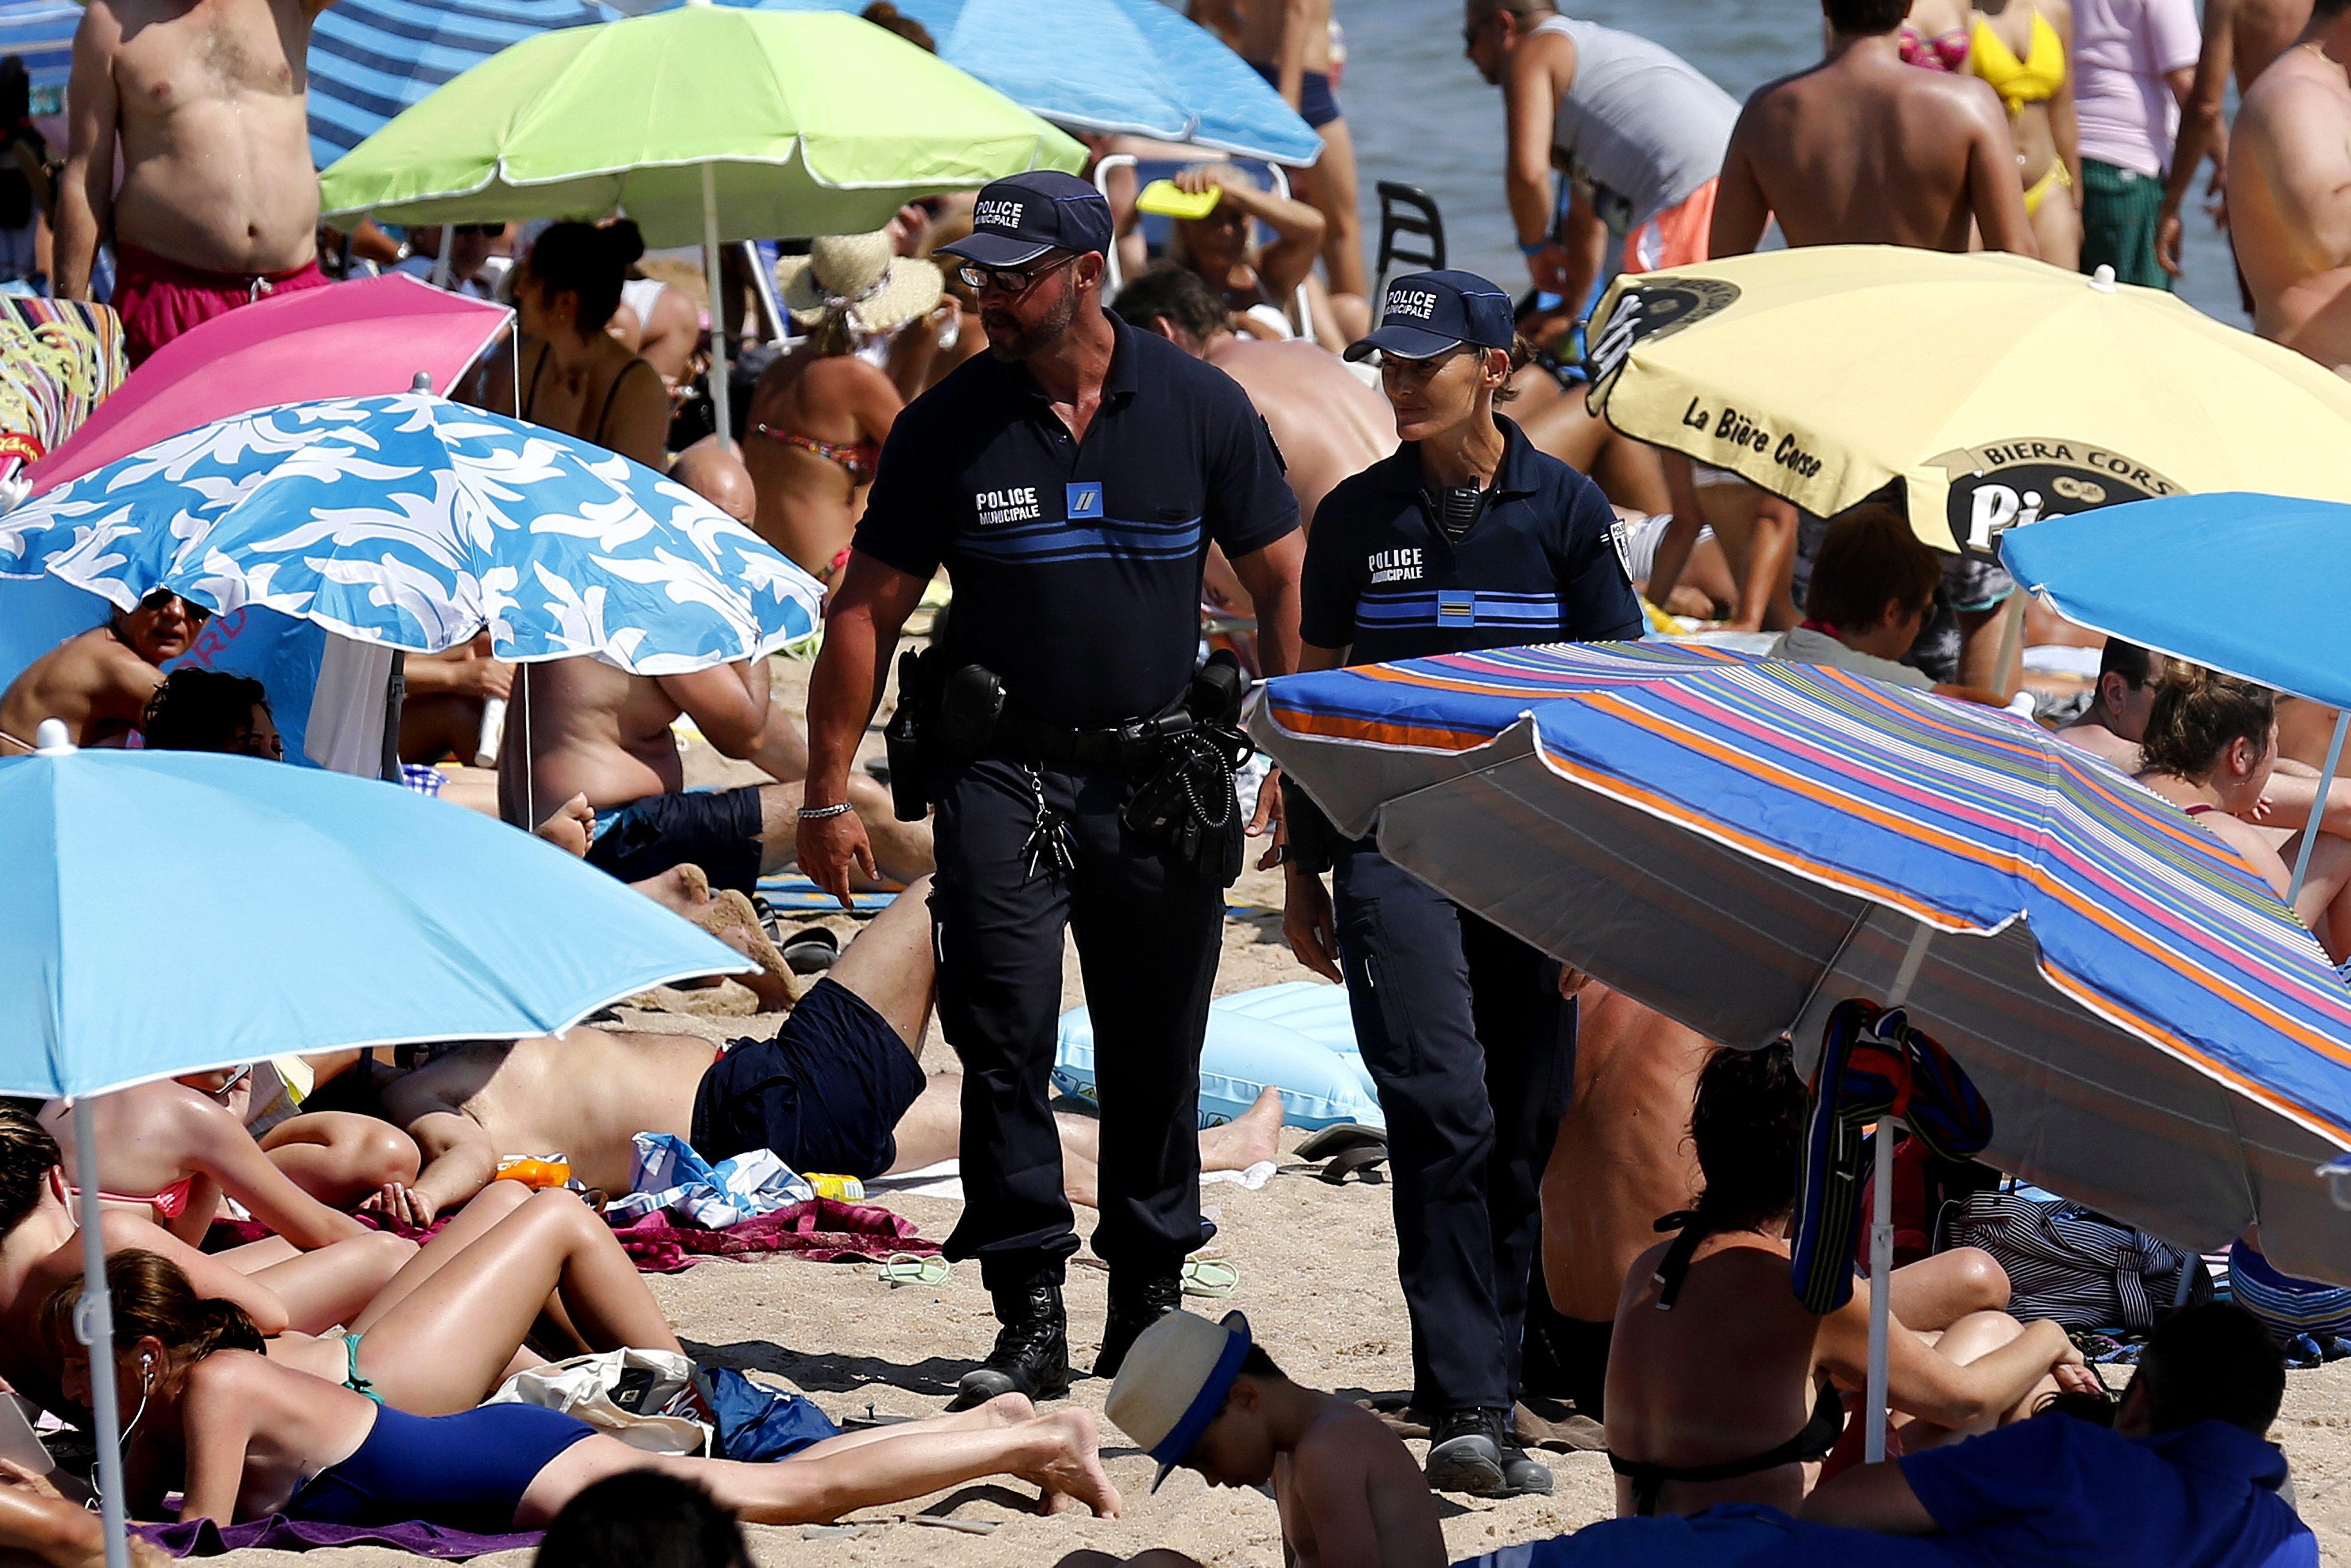 O femeie musulmana, obligata de politisti sa isi dea jos costumul burkini. Scenele surprinse pe plaja, in Nisa